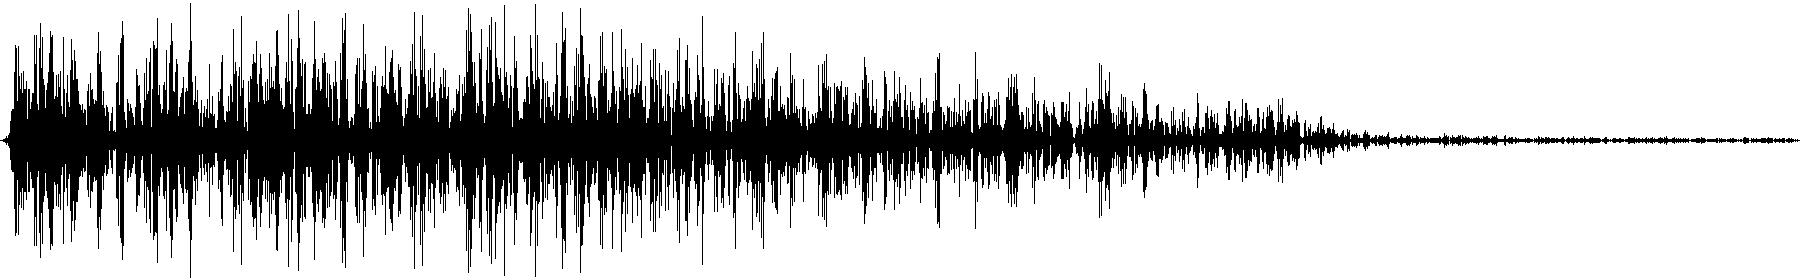 shg percussion 36